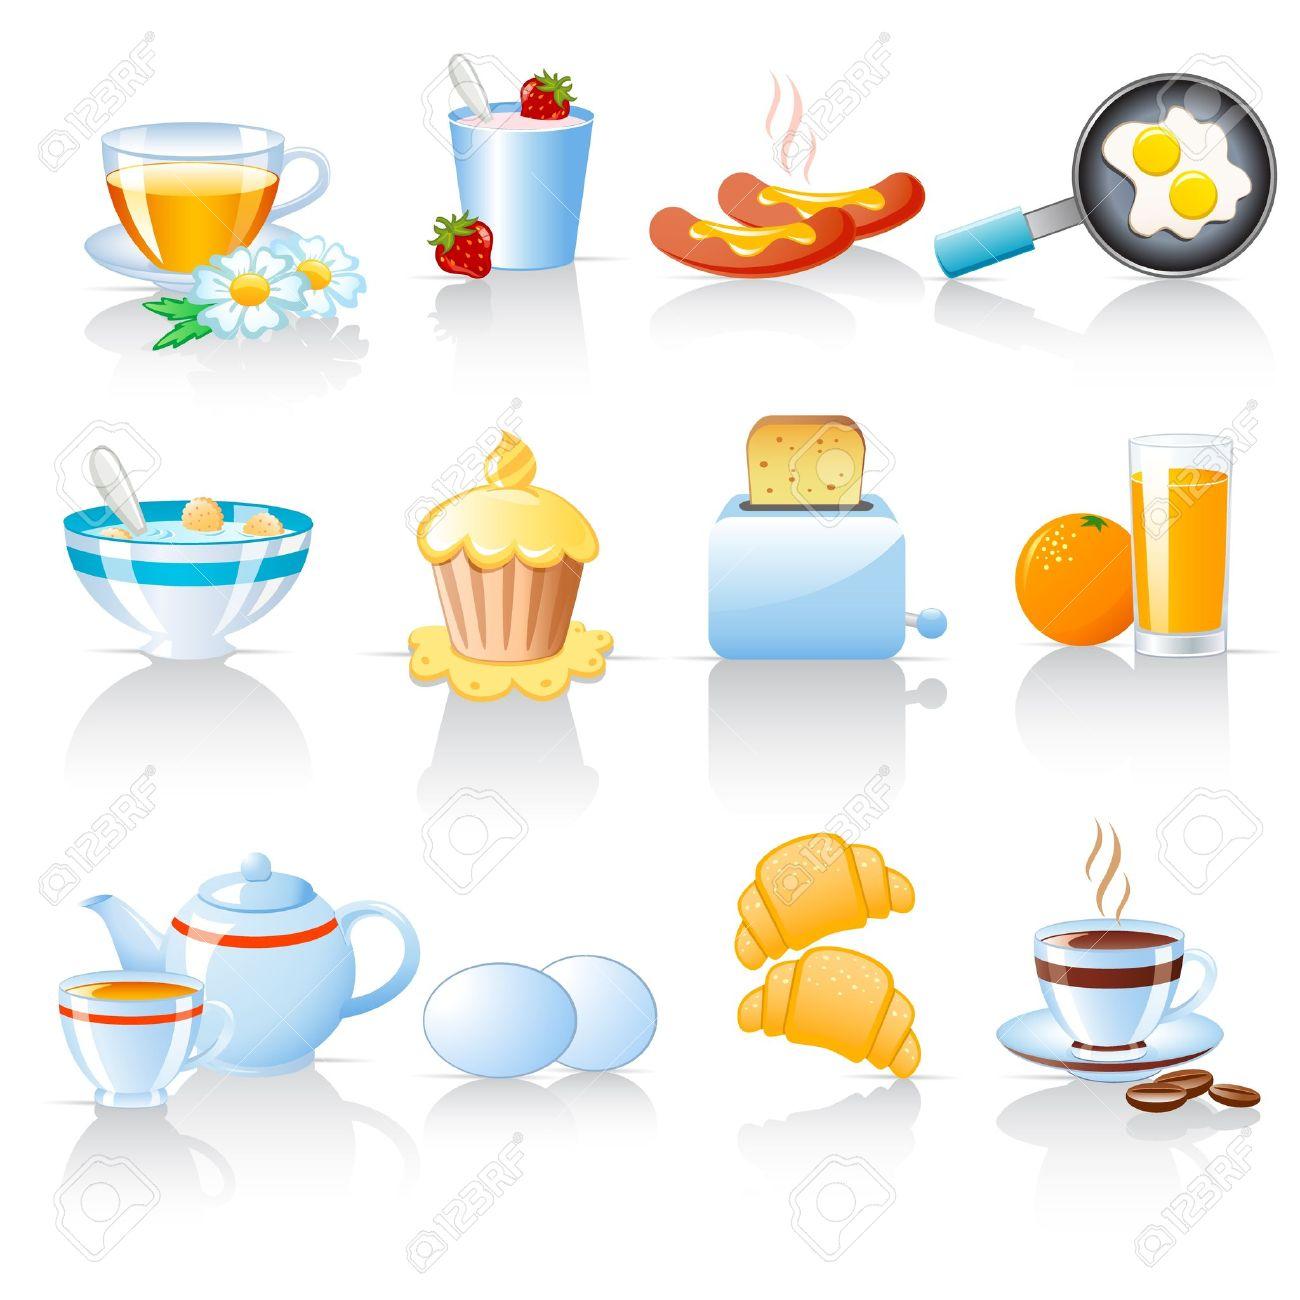 Breakfast icons Stock Vector - 12029434